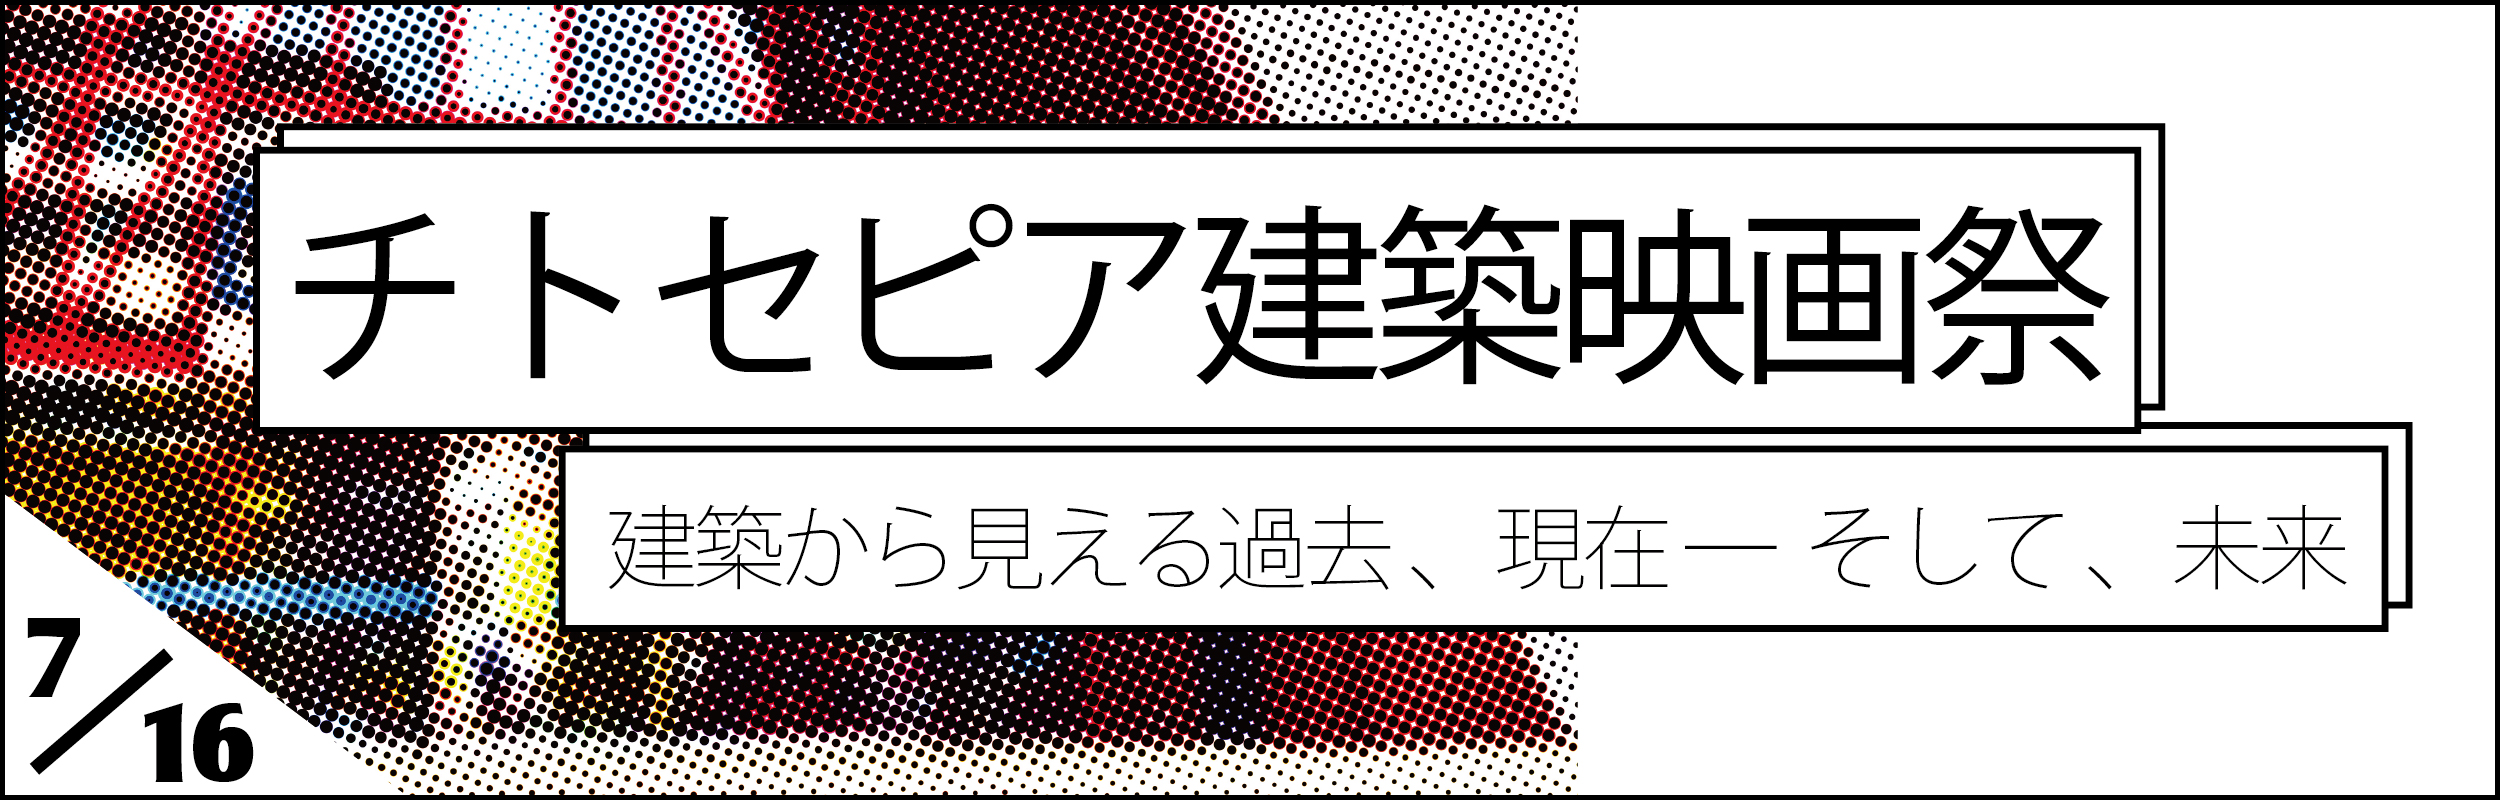 amf-banner